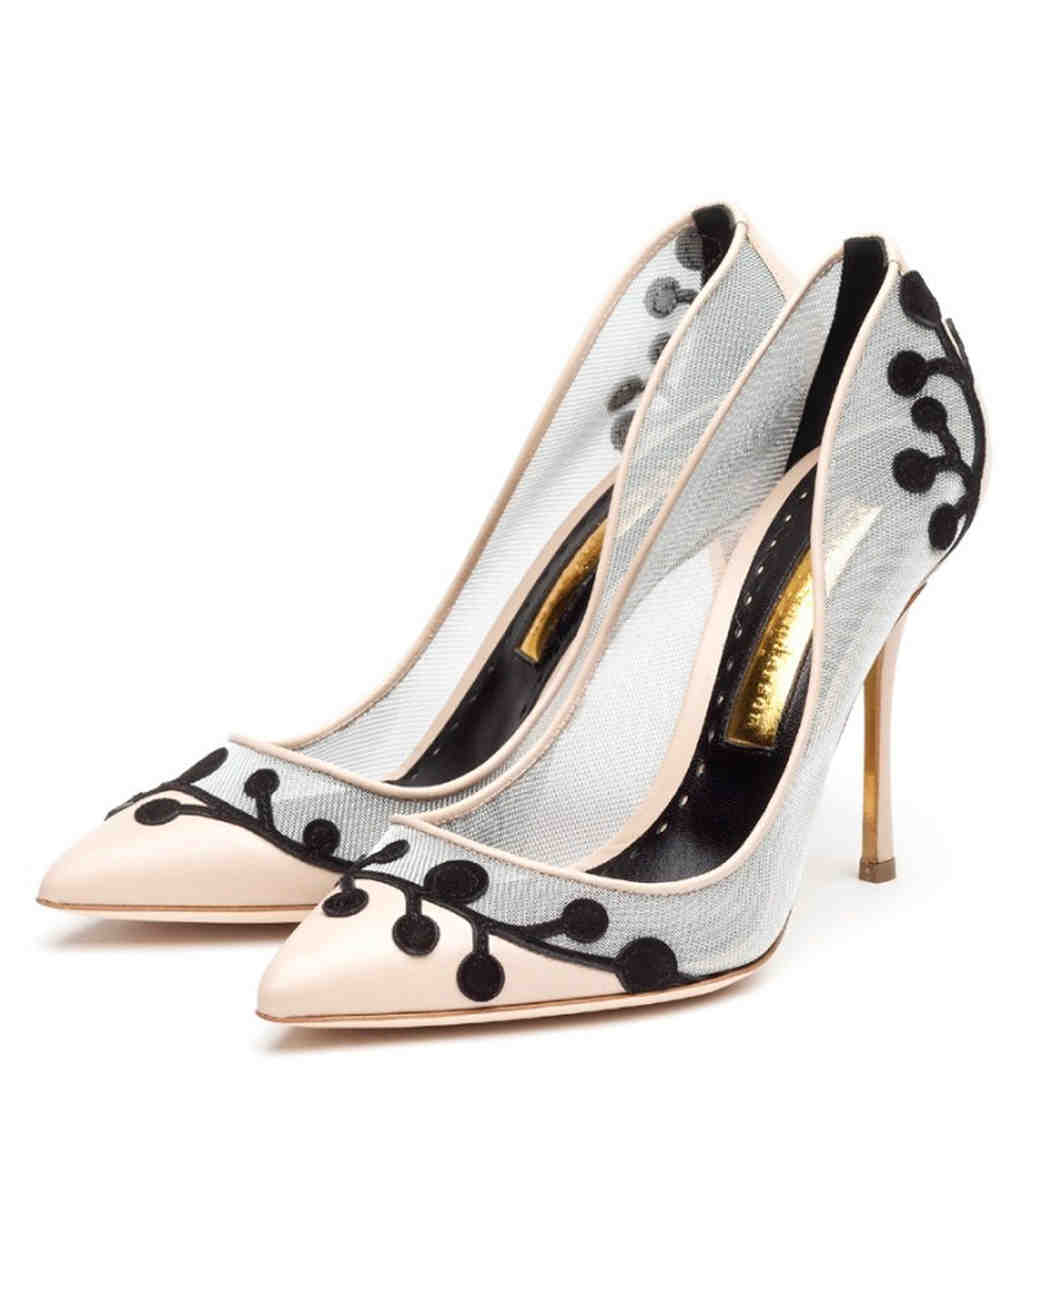 mesh-wedding-shoes-rupert-sanderson-fiorella-0315.jpg